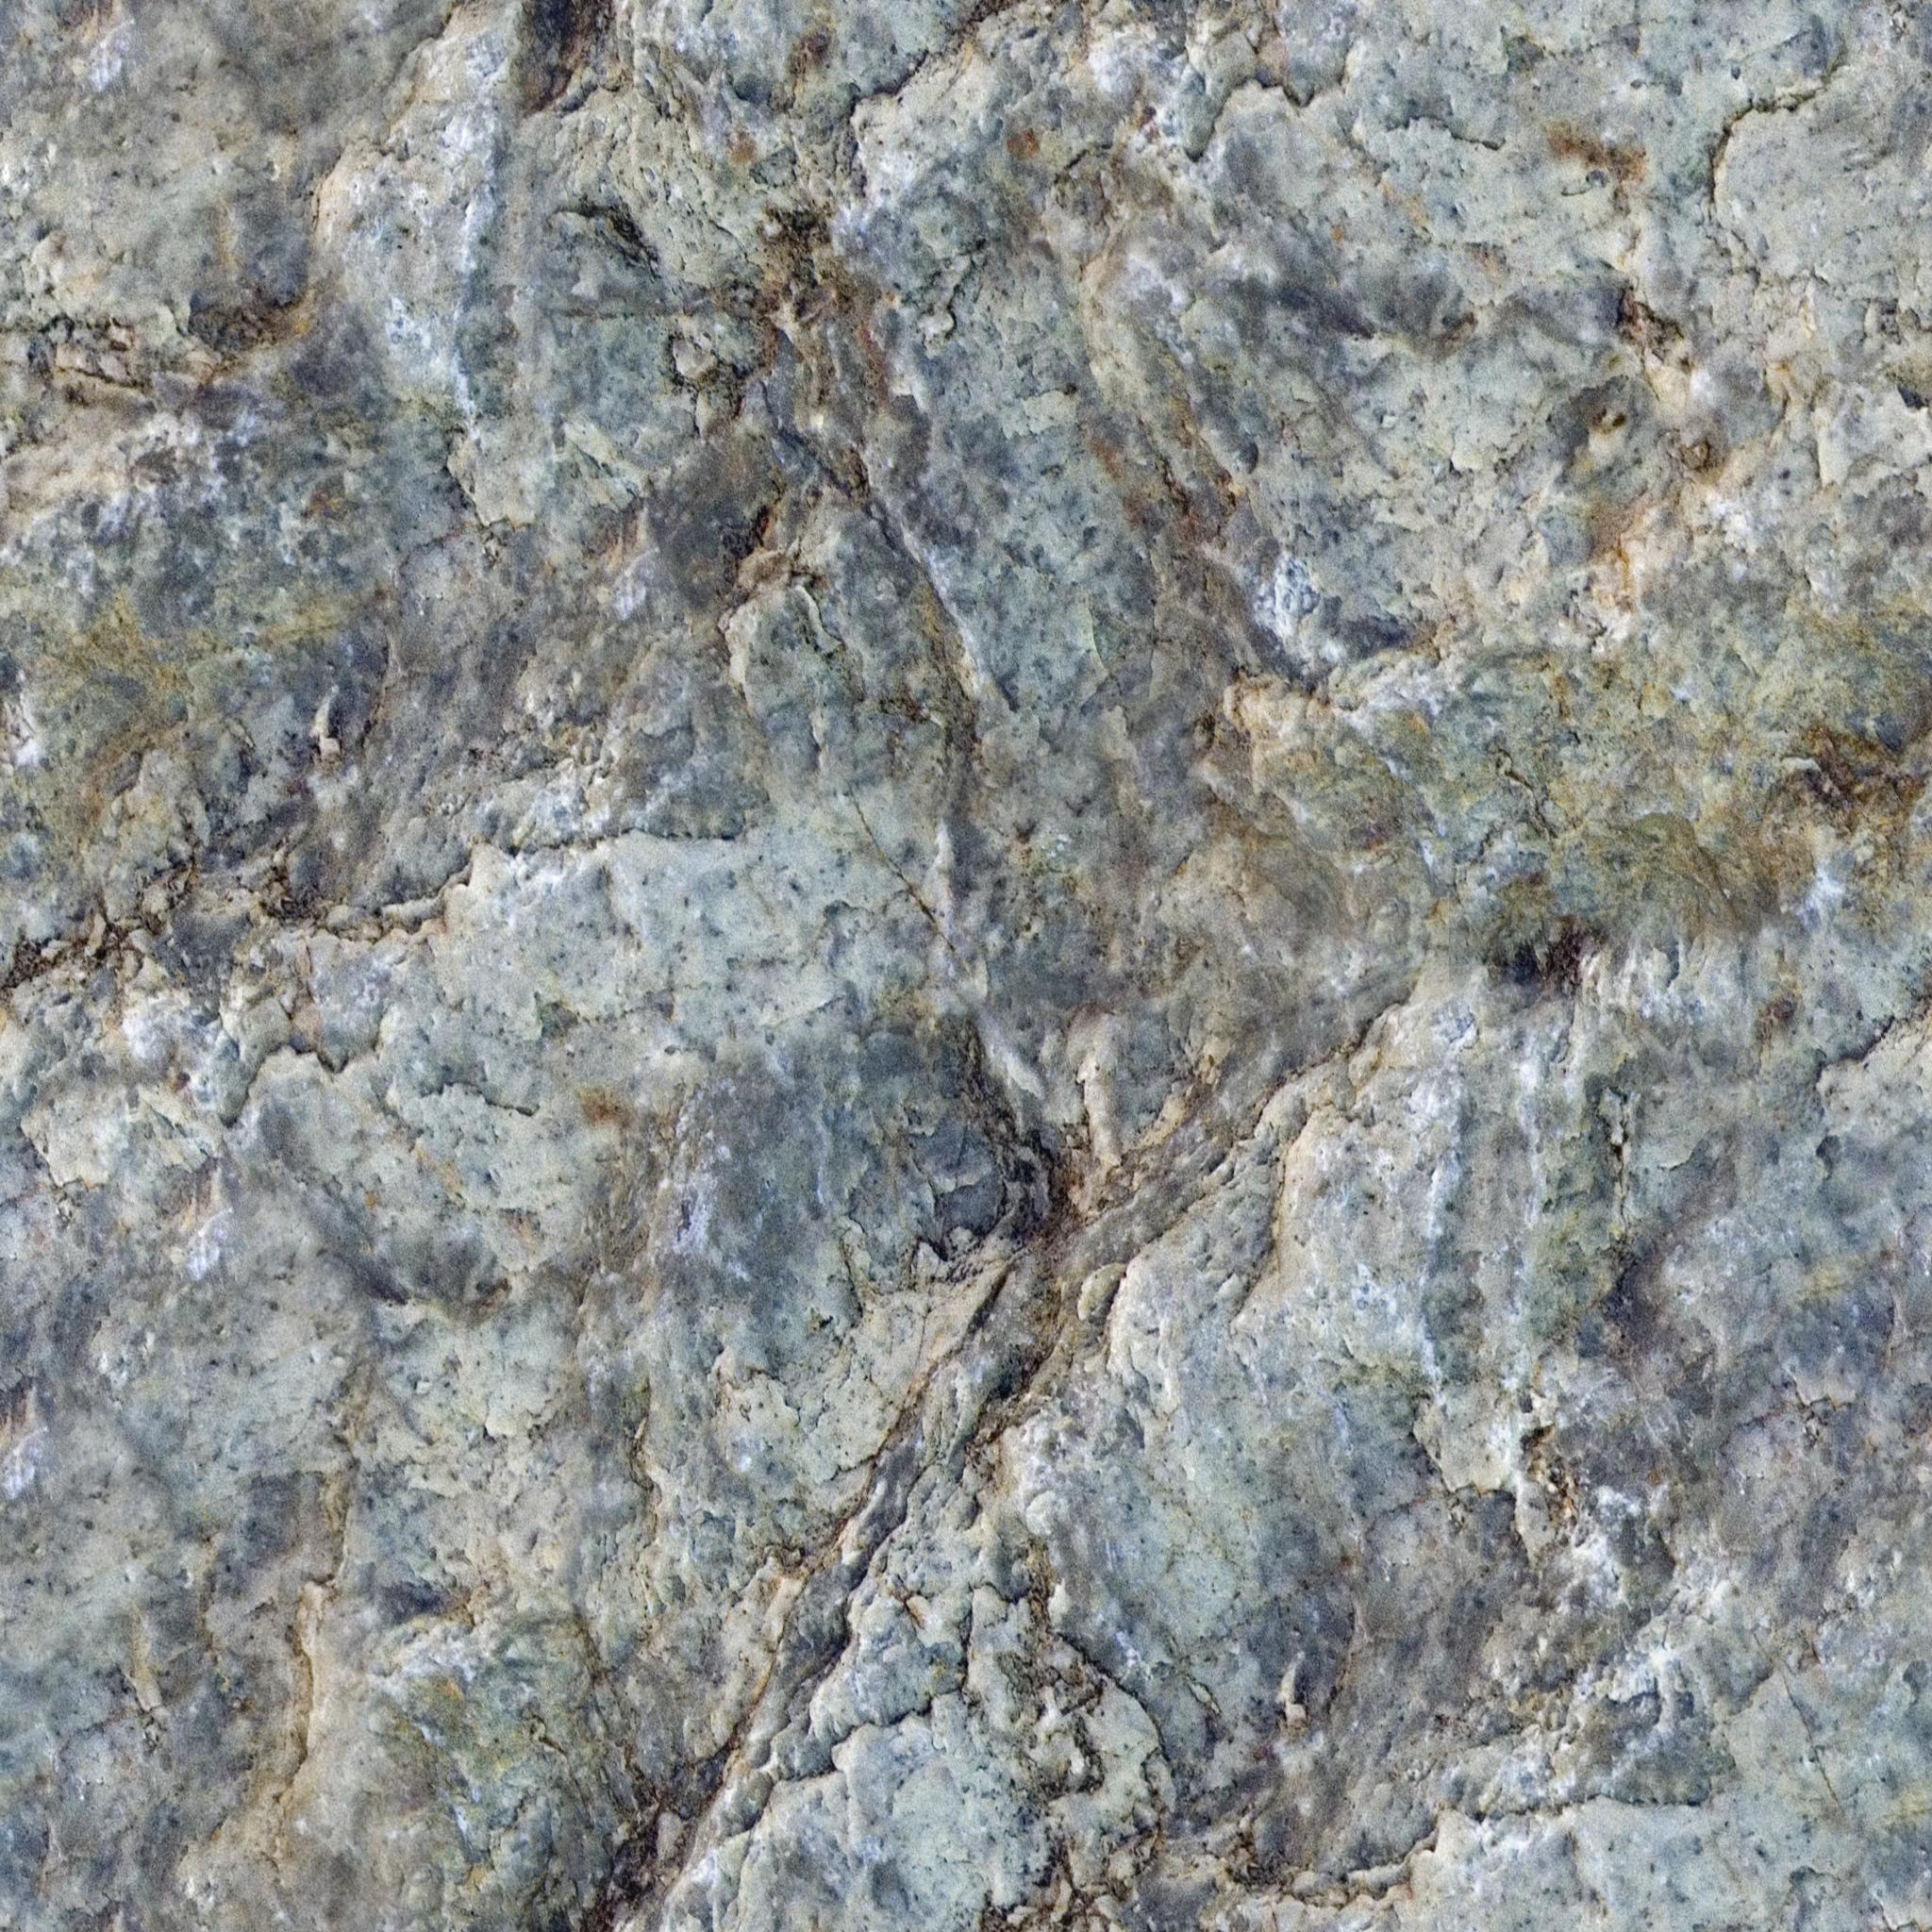 Bluish Gray Rock.jpg